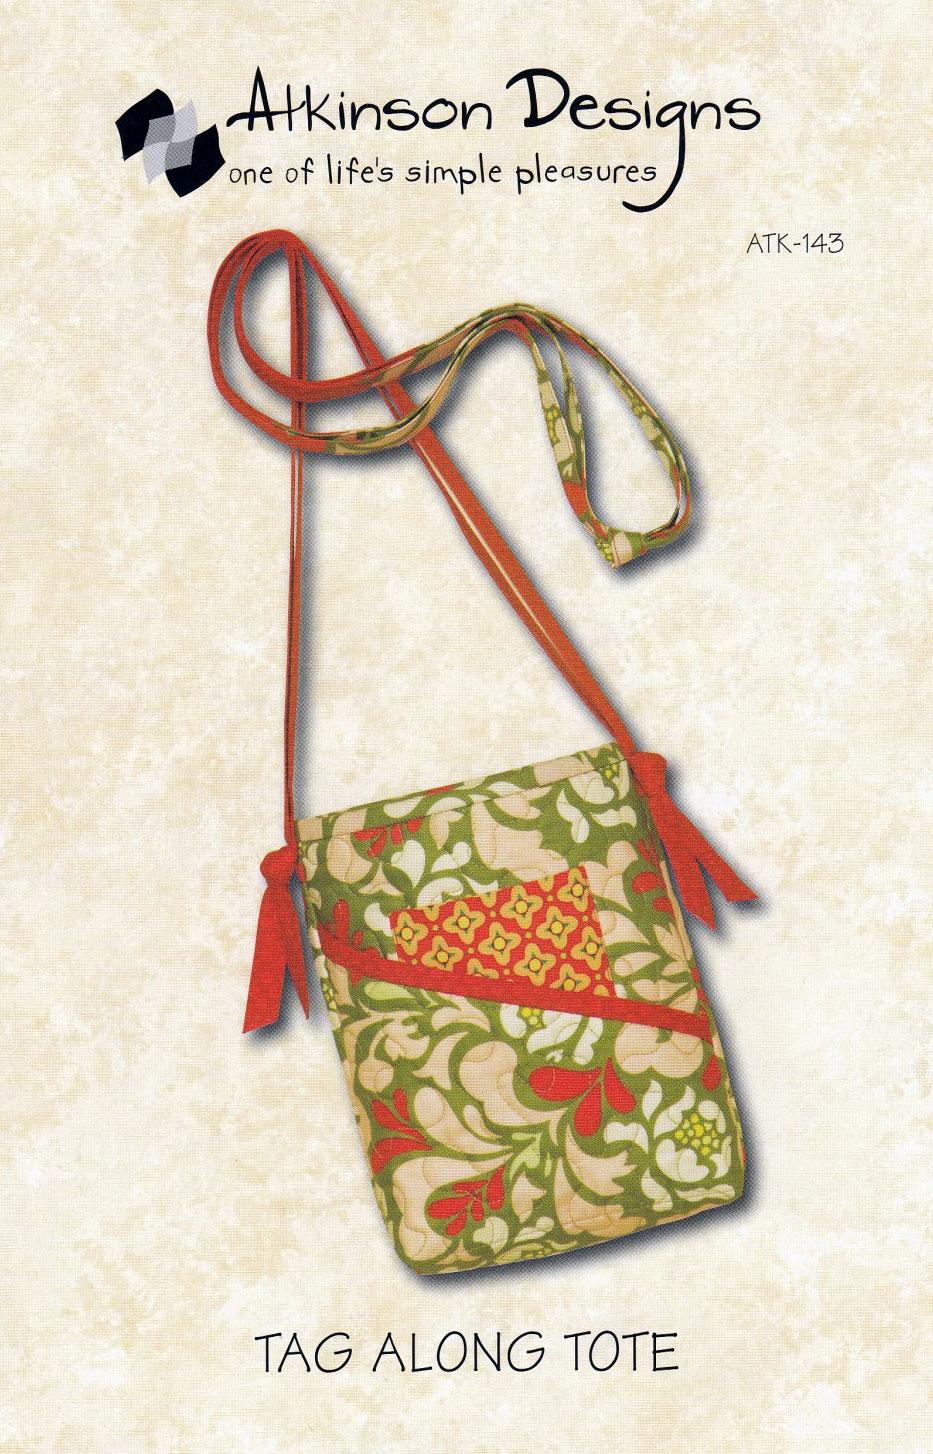 Tag-along-tote-sewing-pattern-Atkinson-Designs-front